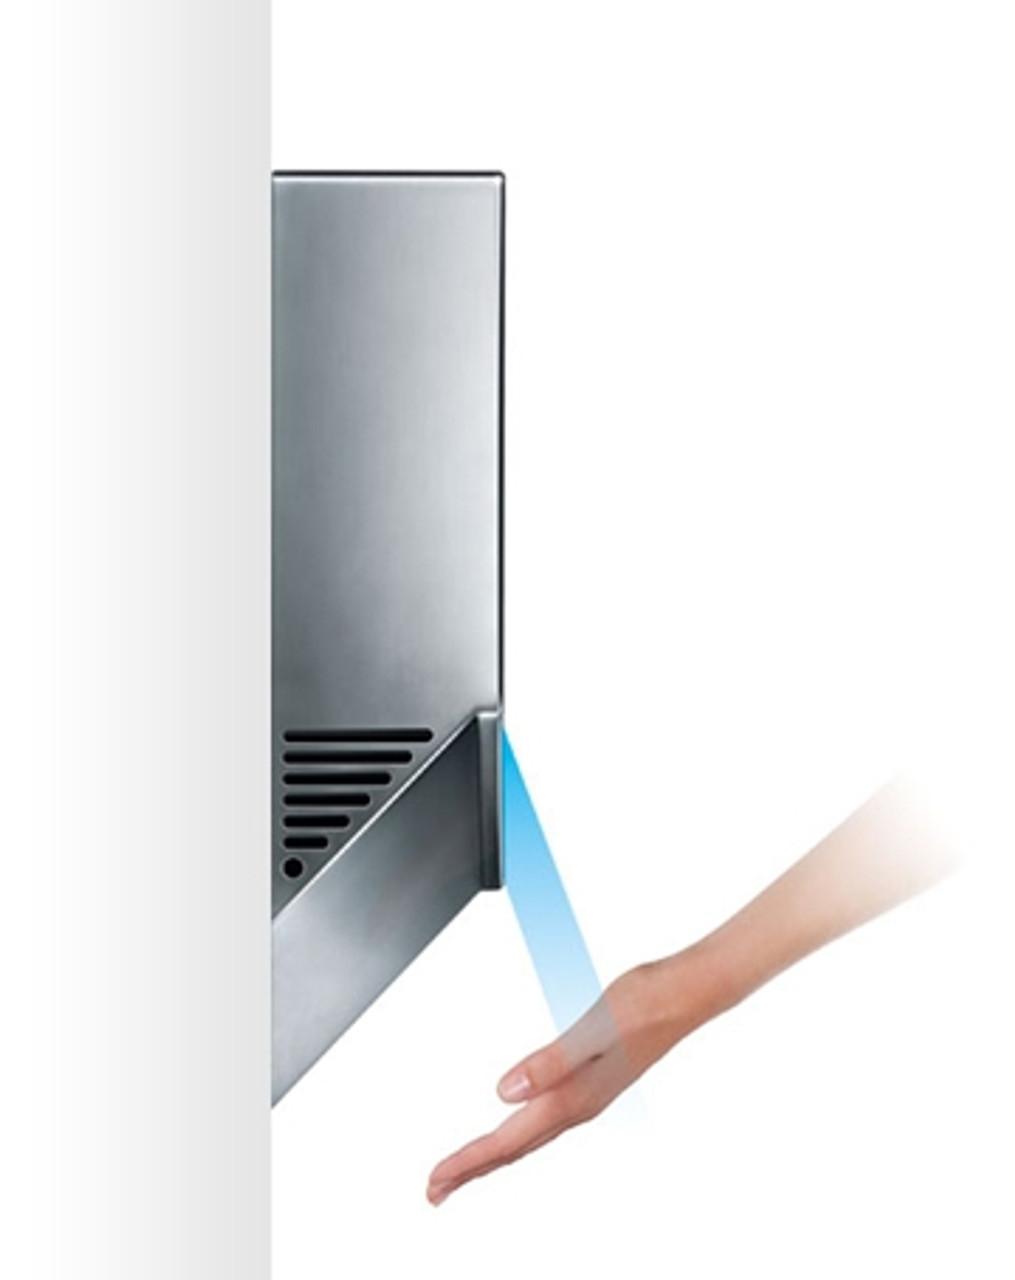 dyson airblade hu02 dyson ab12 nickel slim hand dryer v. Black Bedroom Furniture Sets. Home Design Ideas